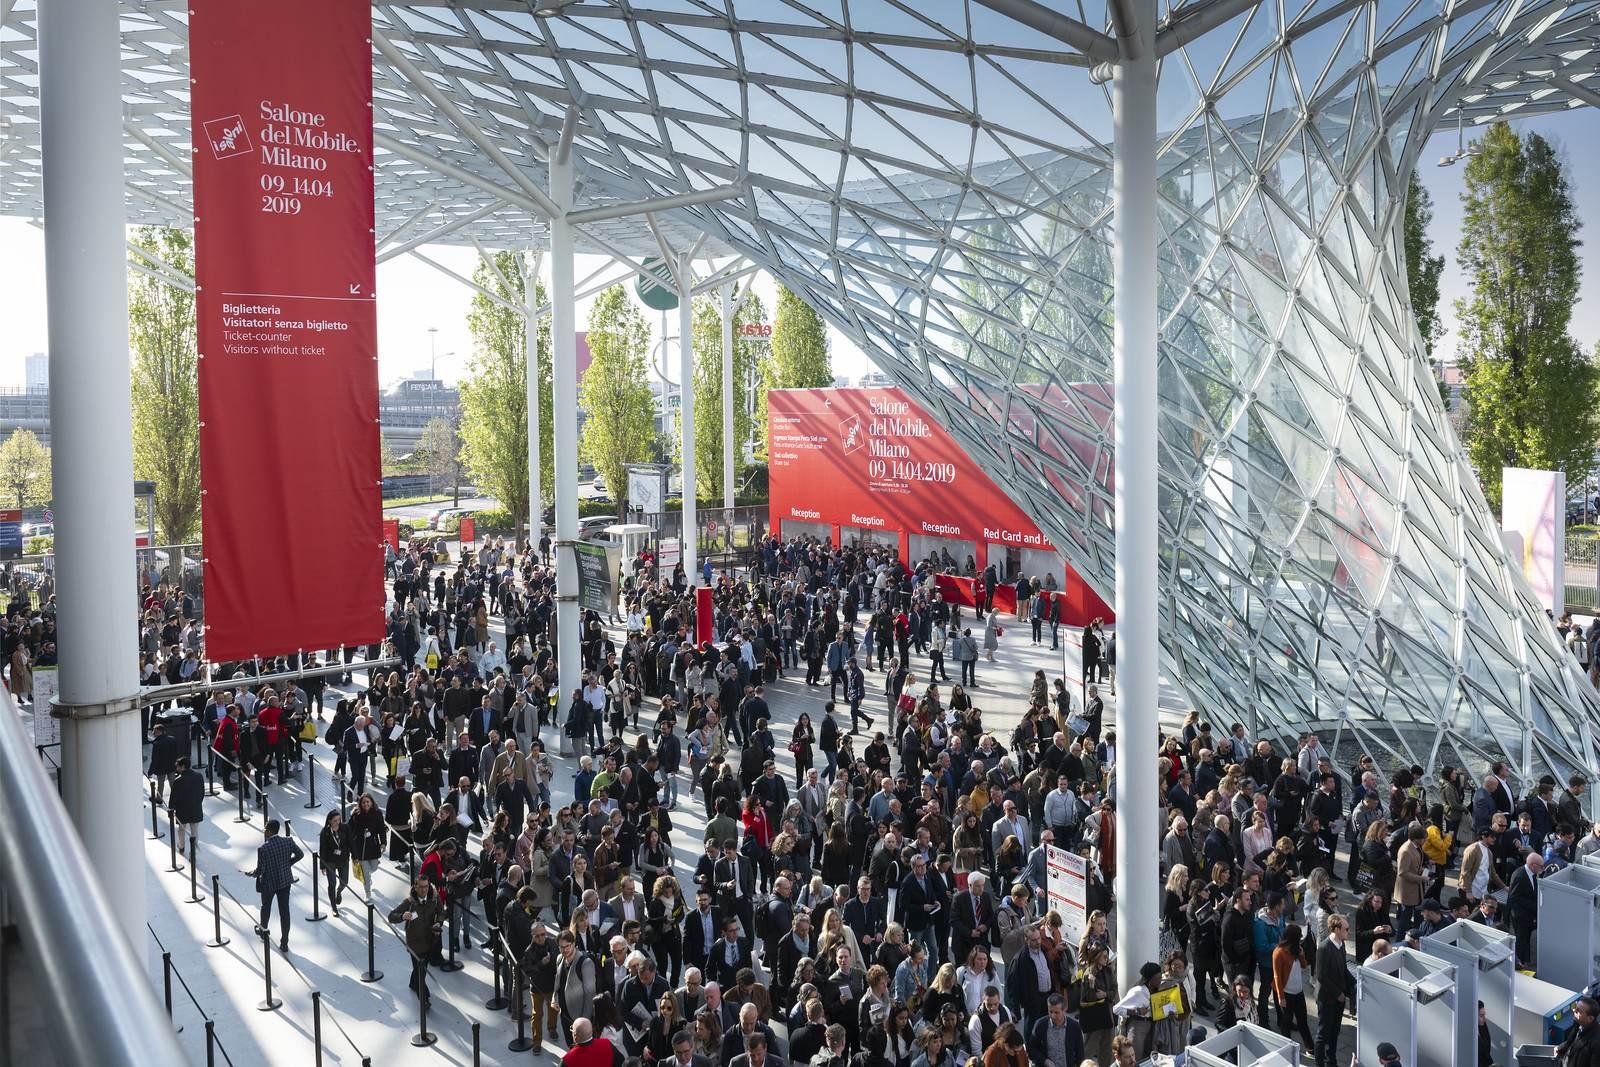 Salone del Mobile 2019 endete erfolgreich